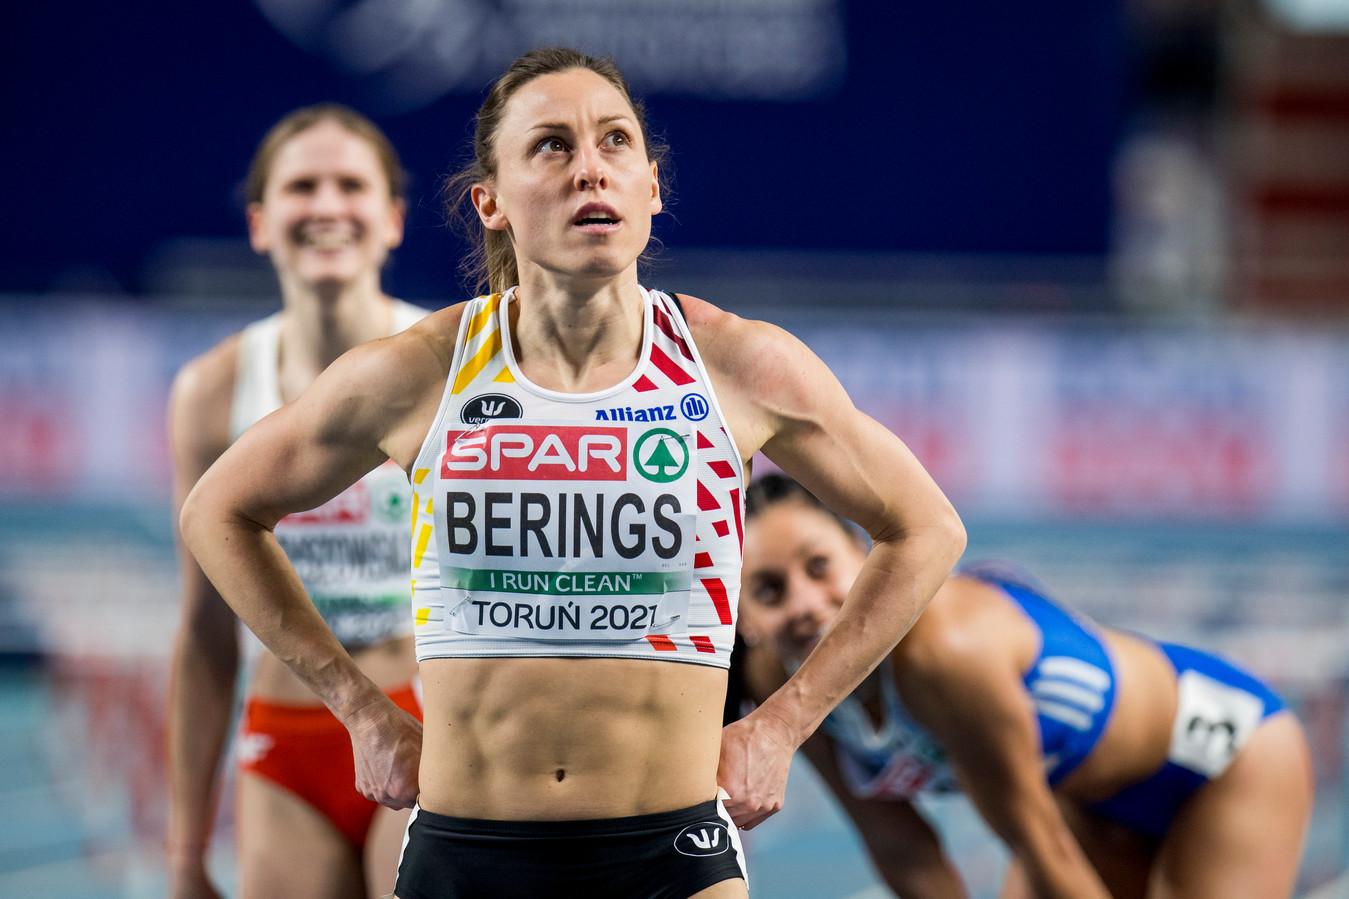 Eline Berings.